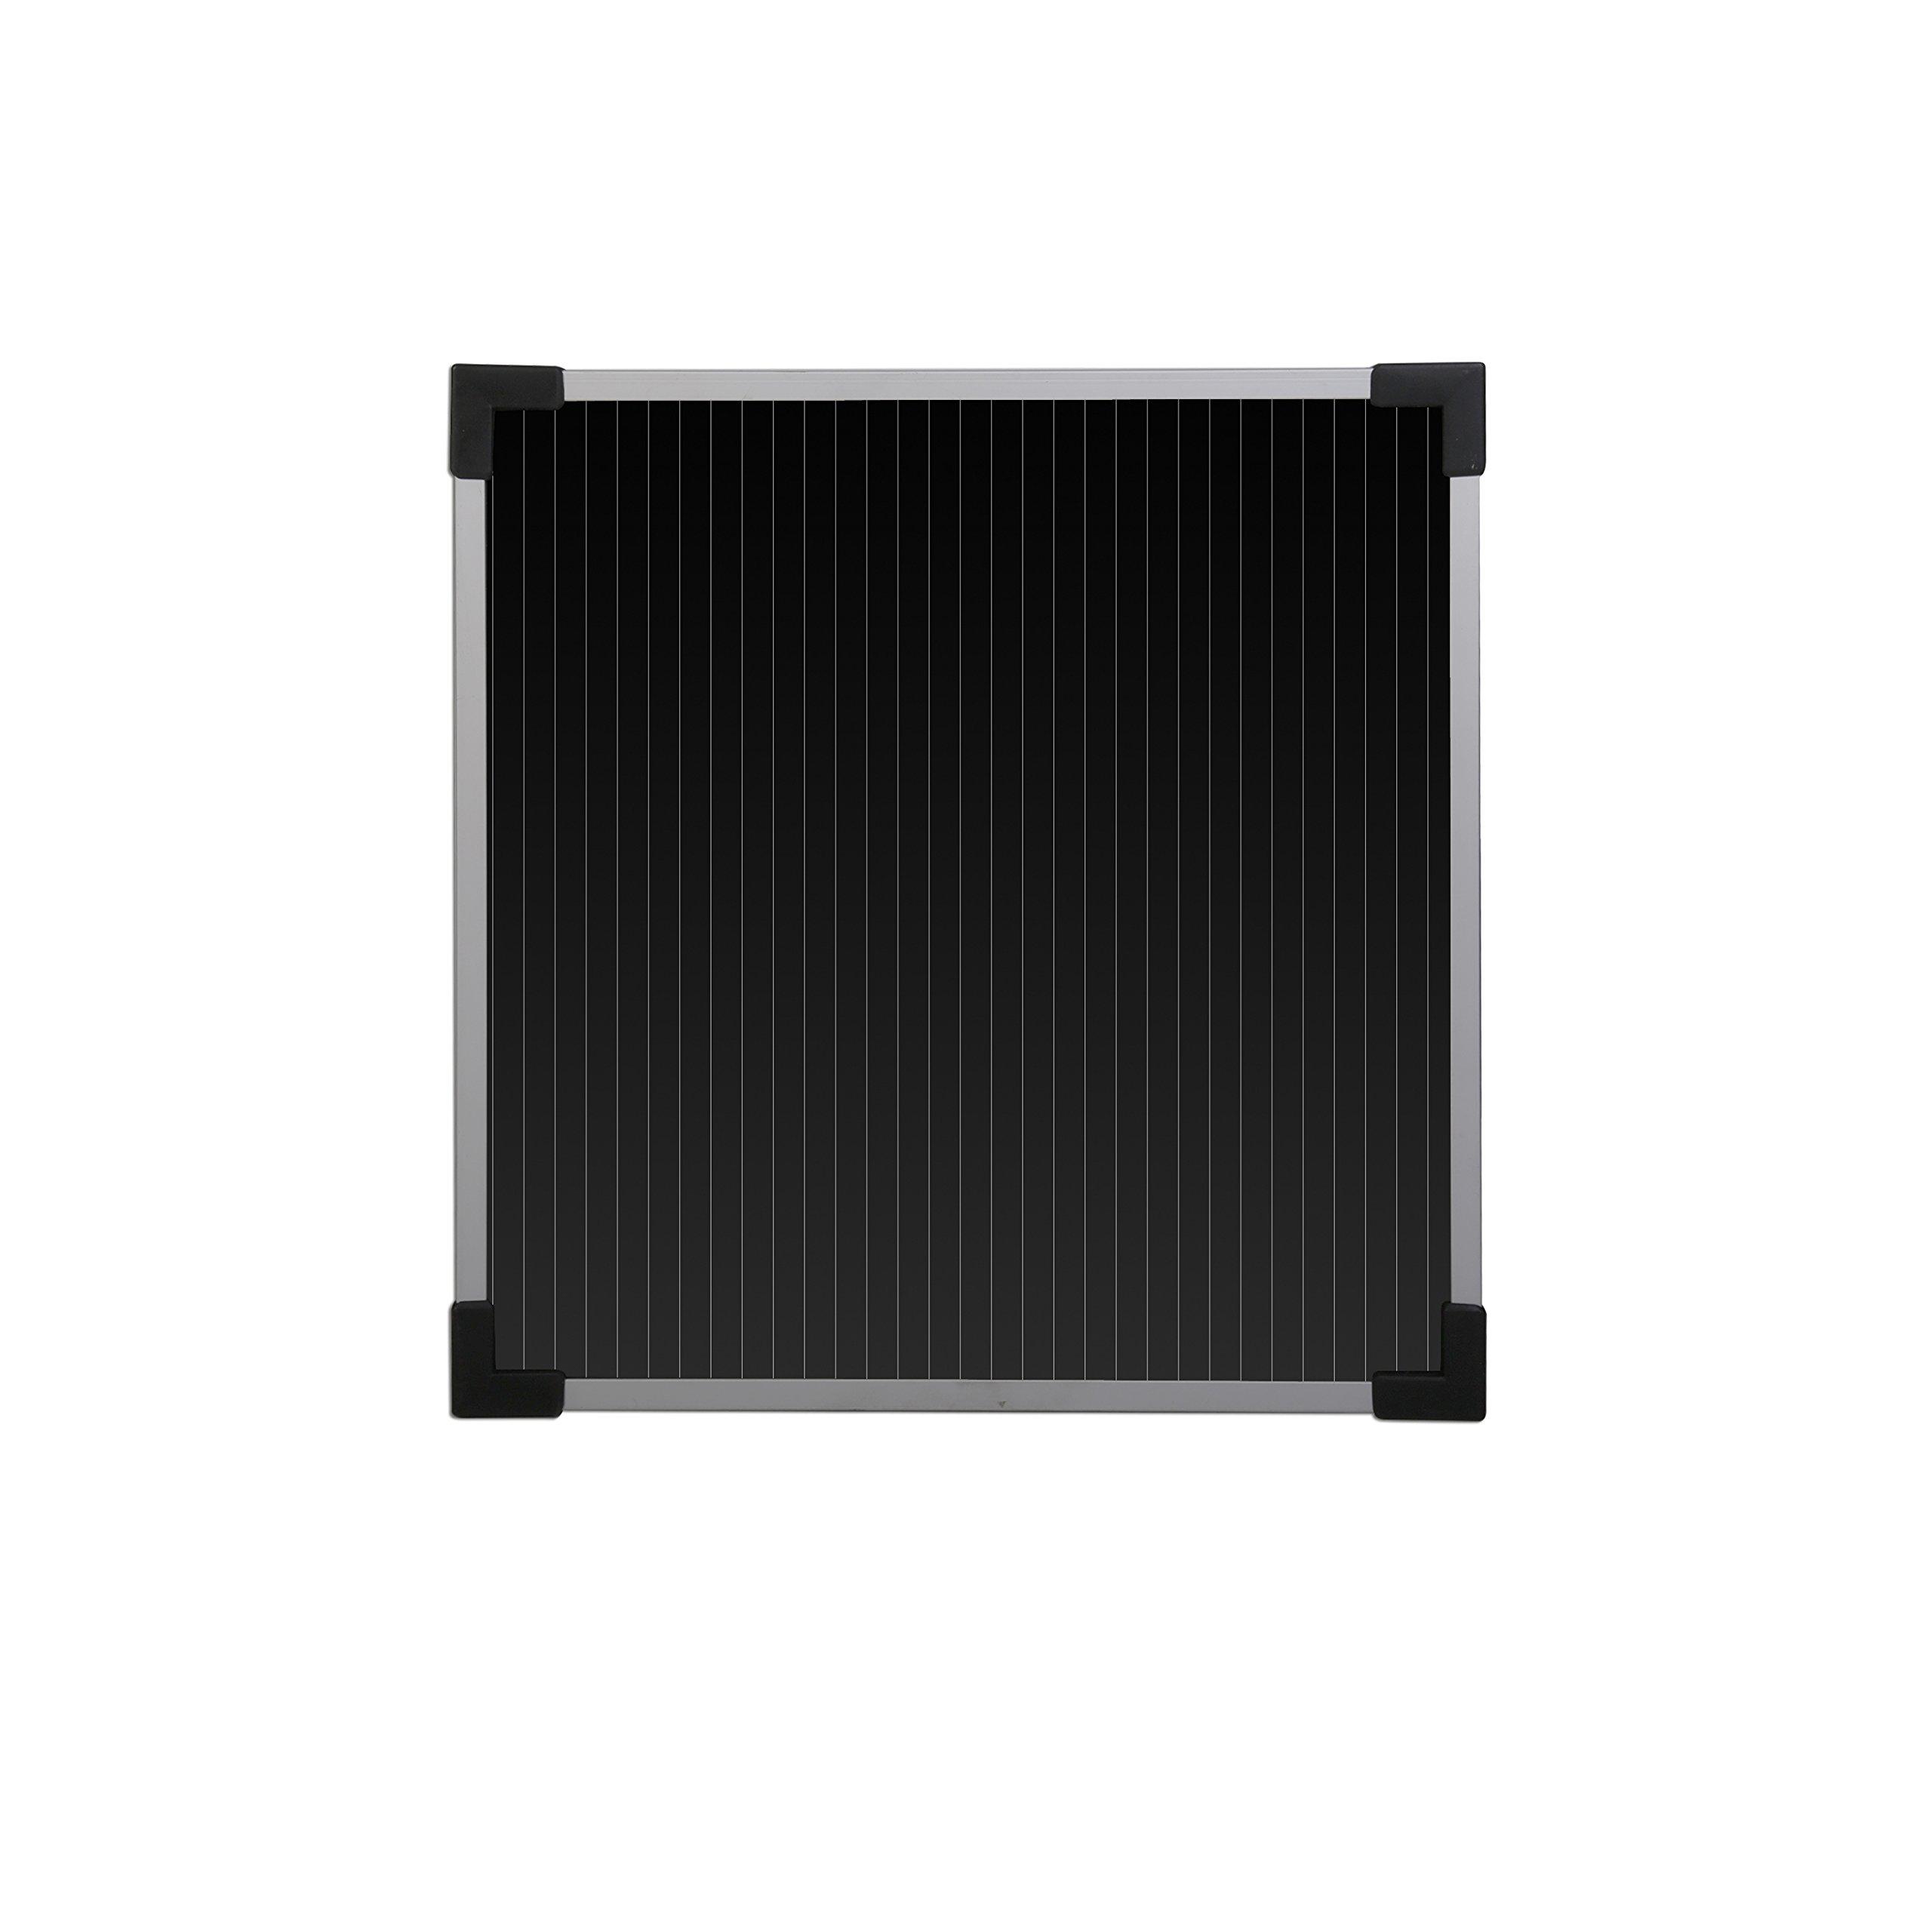 Sunforce 50022 5-Watt Solar Battery Trickle Charger by Sunforce (Image #1)